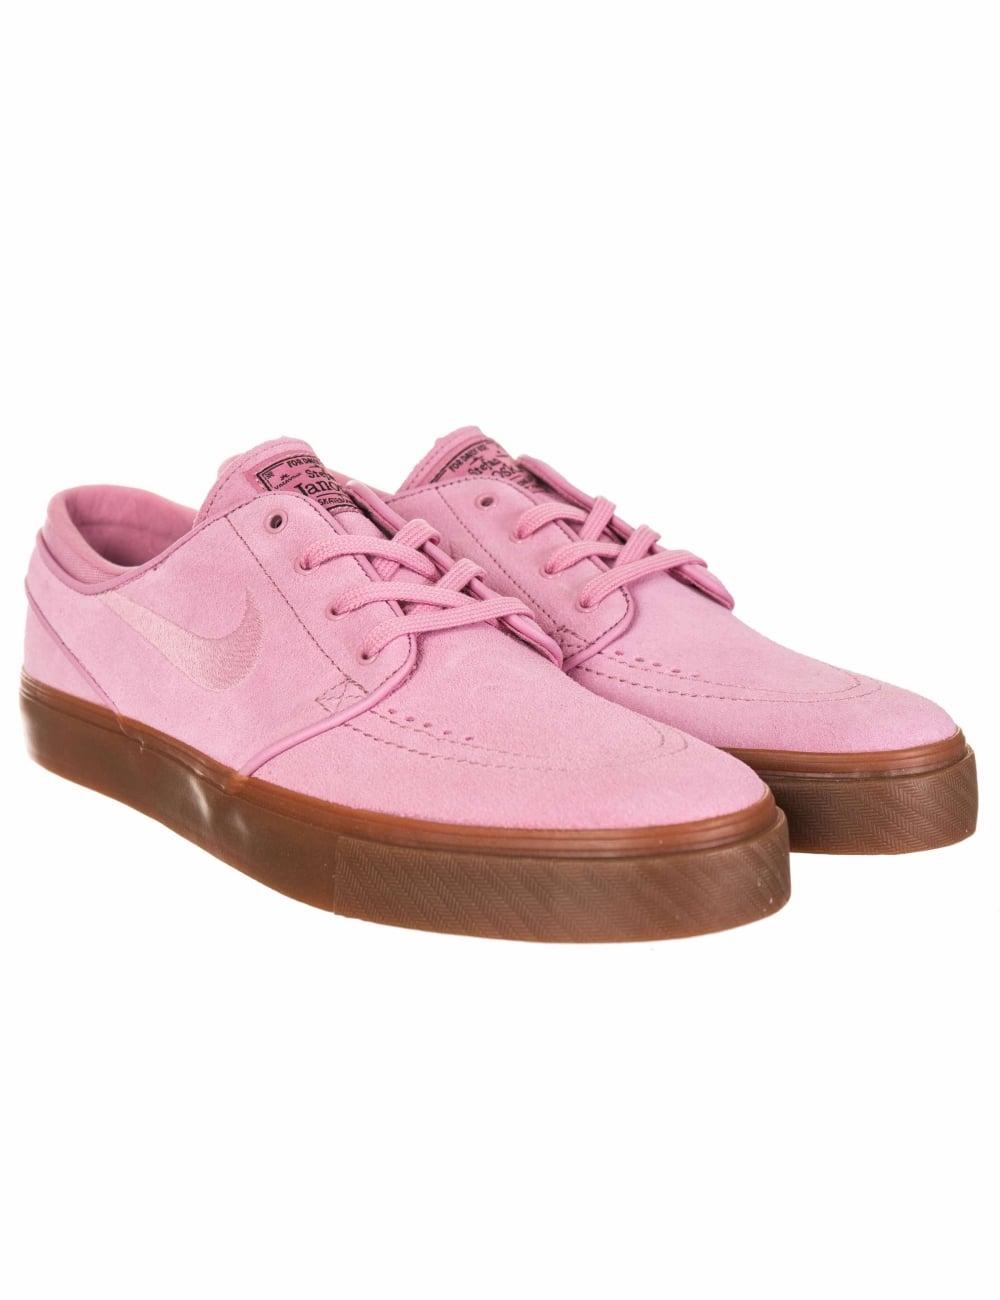 cf45b7f14a59 Nike SB Stefan Janoski Trainers - Elemental Pink - Footwear from Fat ...